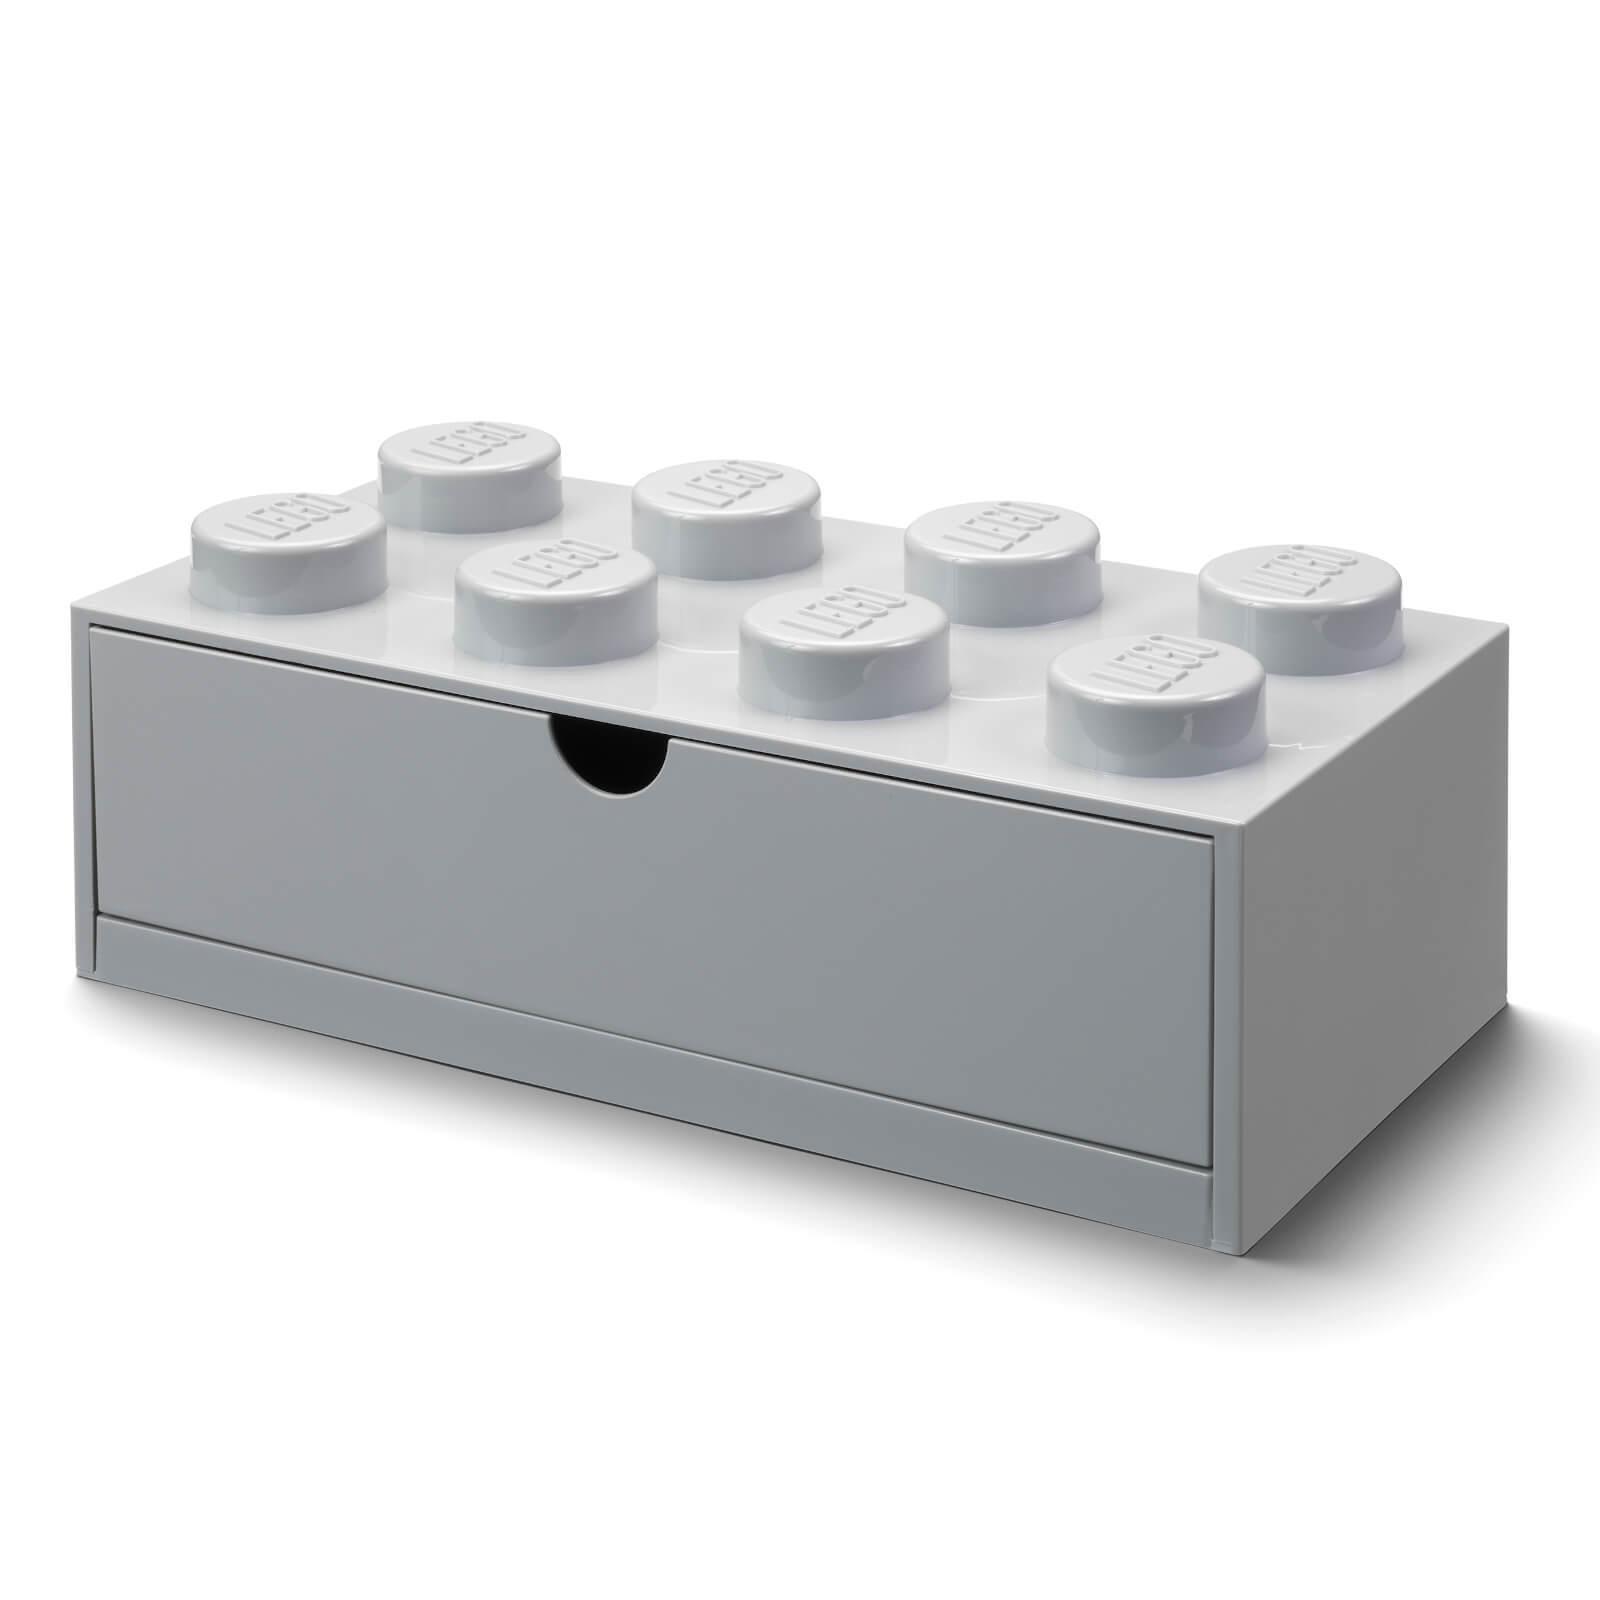 Image of LEGO Storage Desk Drawer 8 - Grey